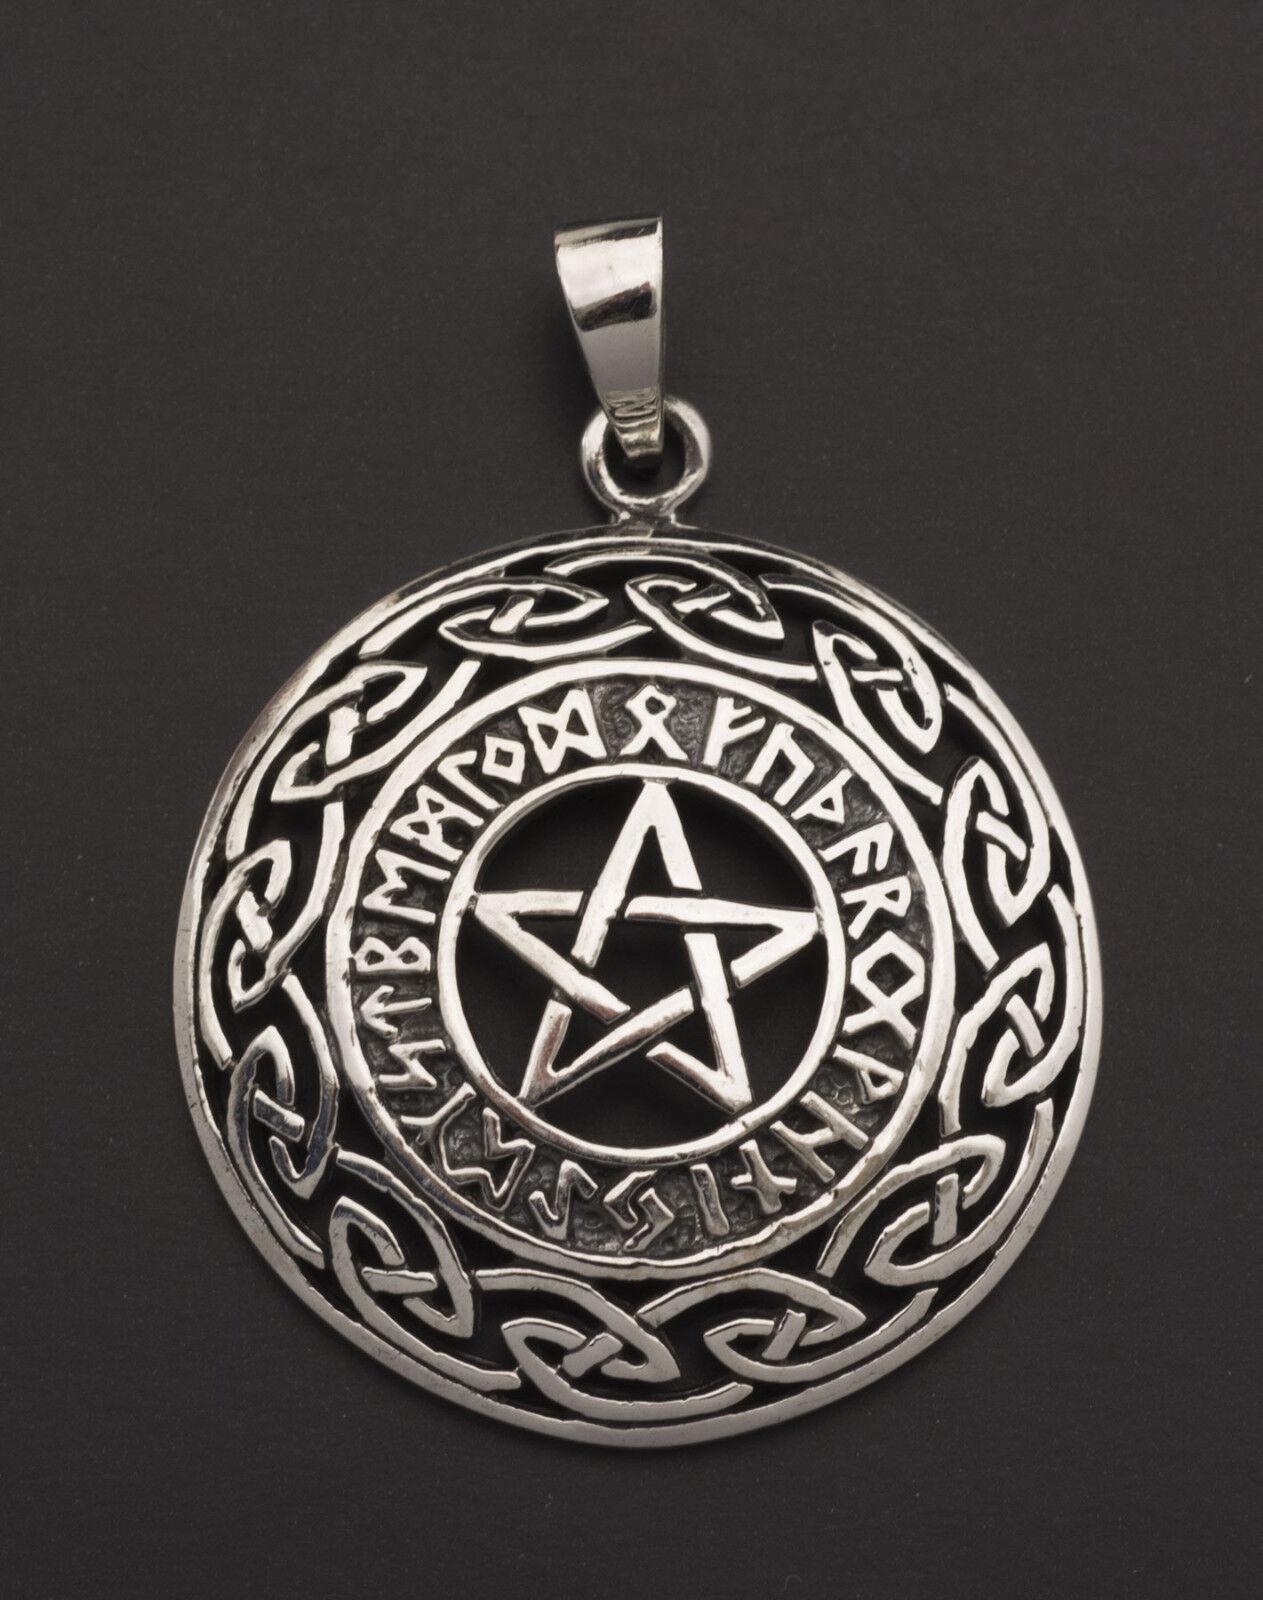 Pendentif tetragramme Rune Viking Pentacle Païen argento 925 7g 25849 25849 25849 K25 a13e13